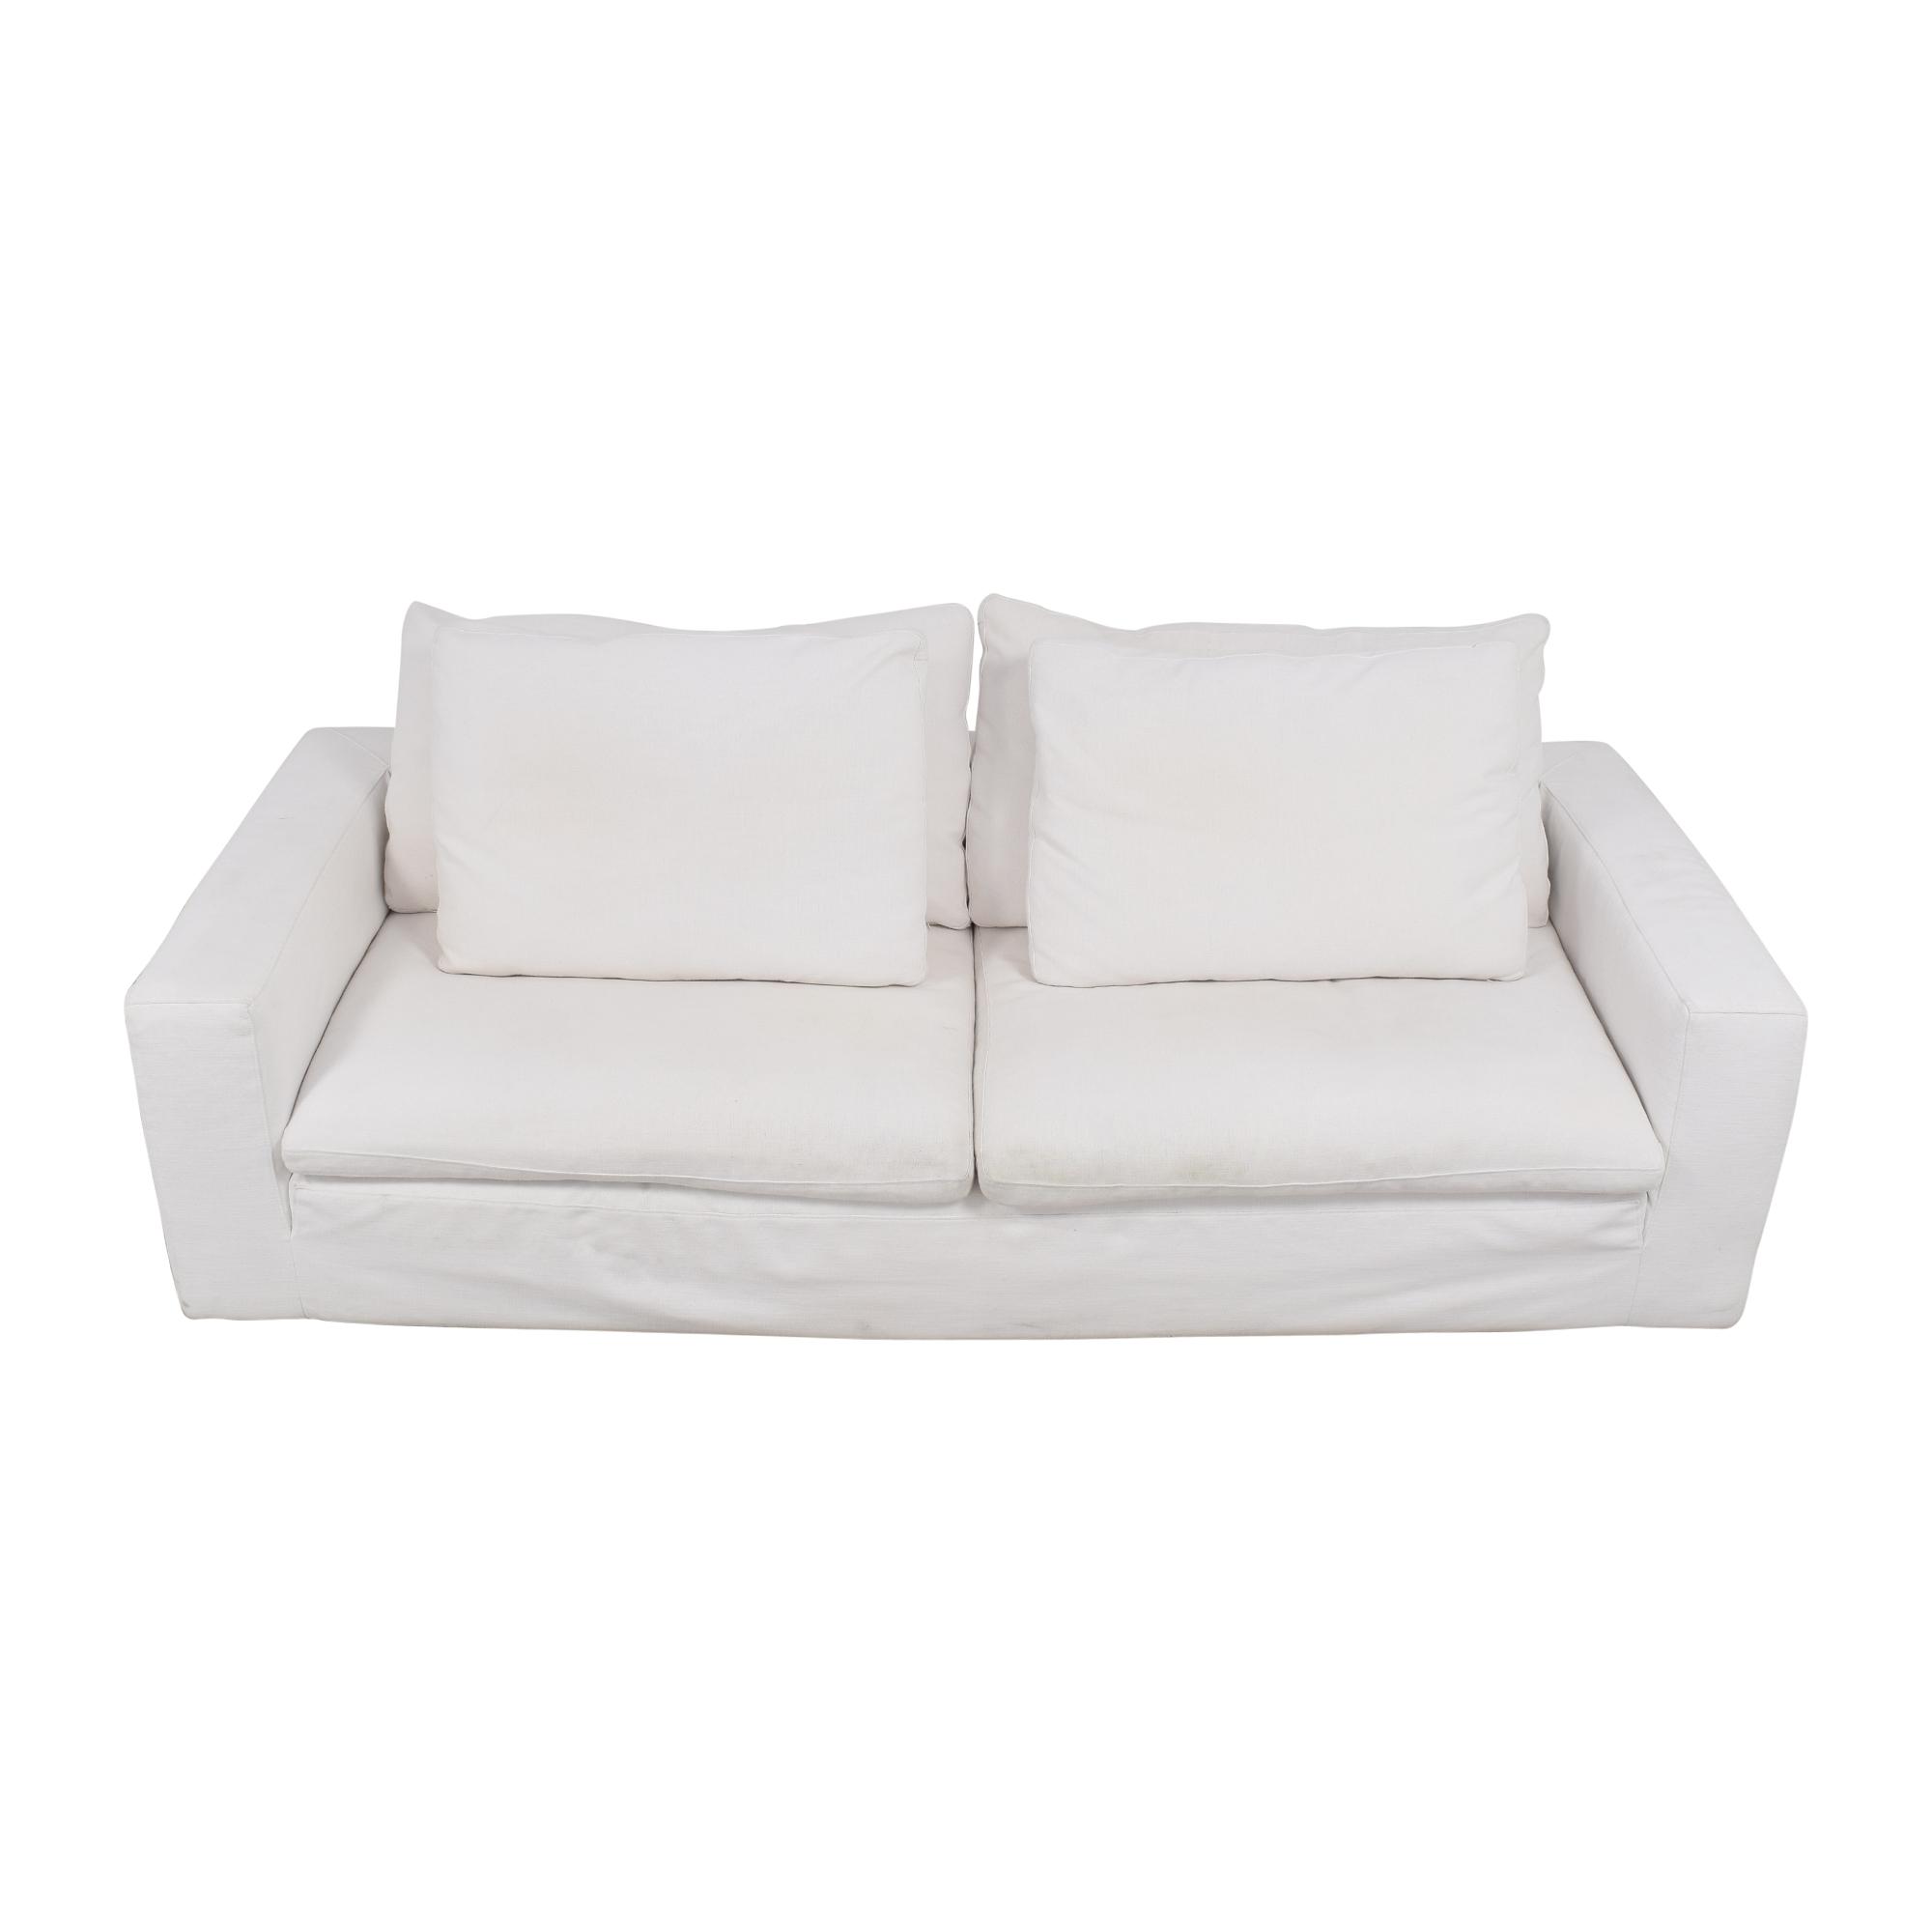 Restoration Hardware Restoration Hardware Cloud Two-Seat-Cushion Sofa